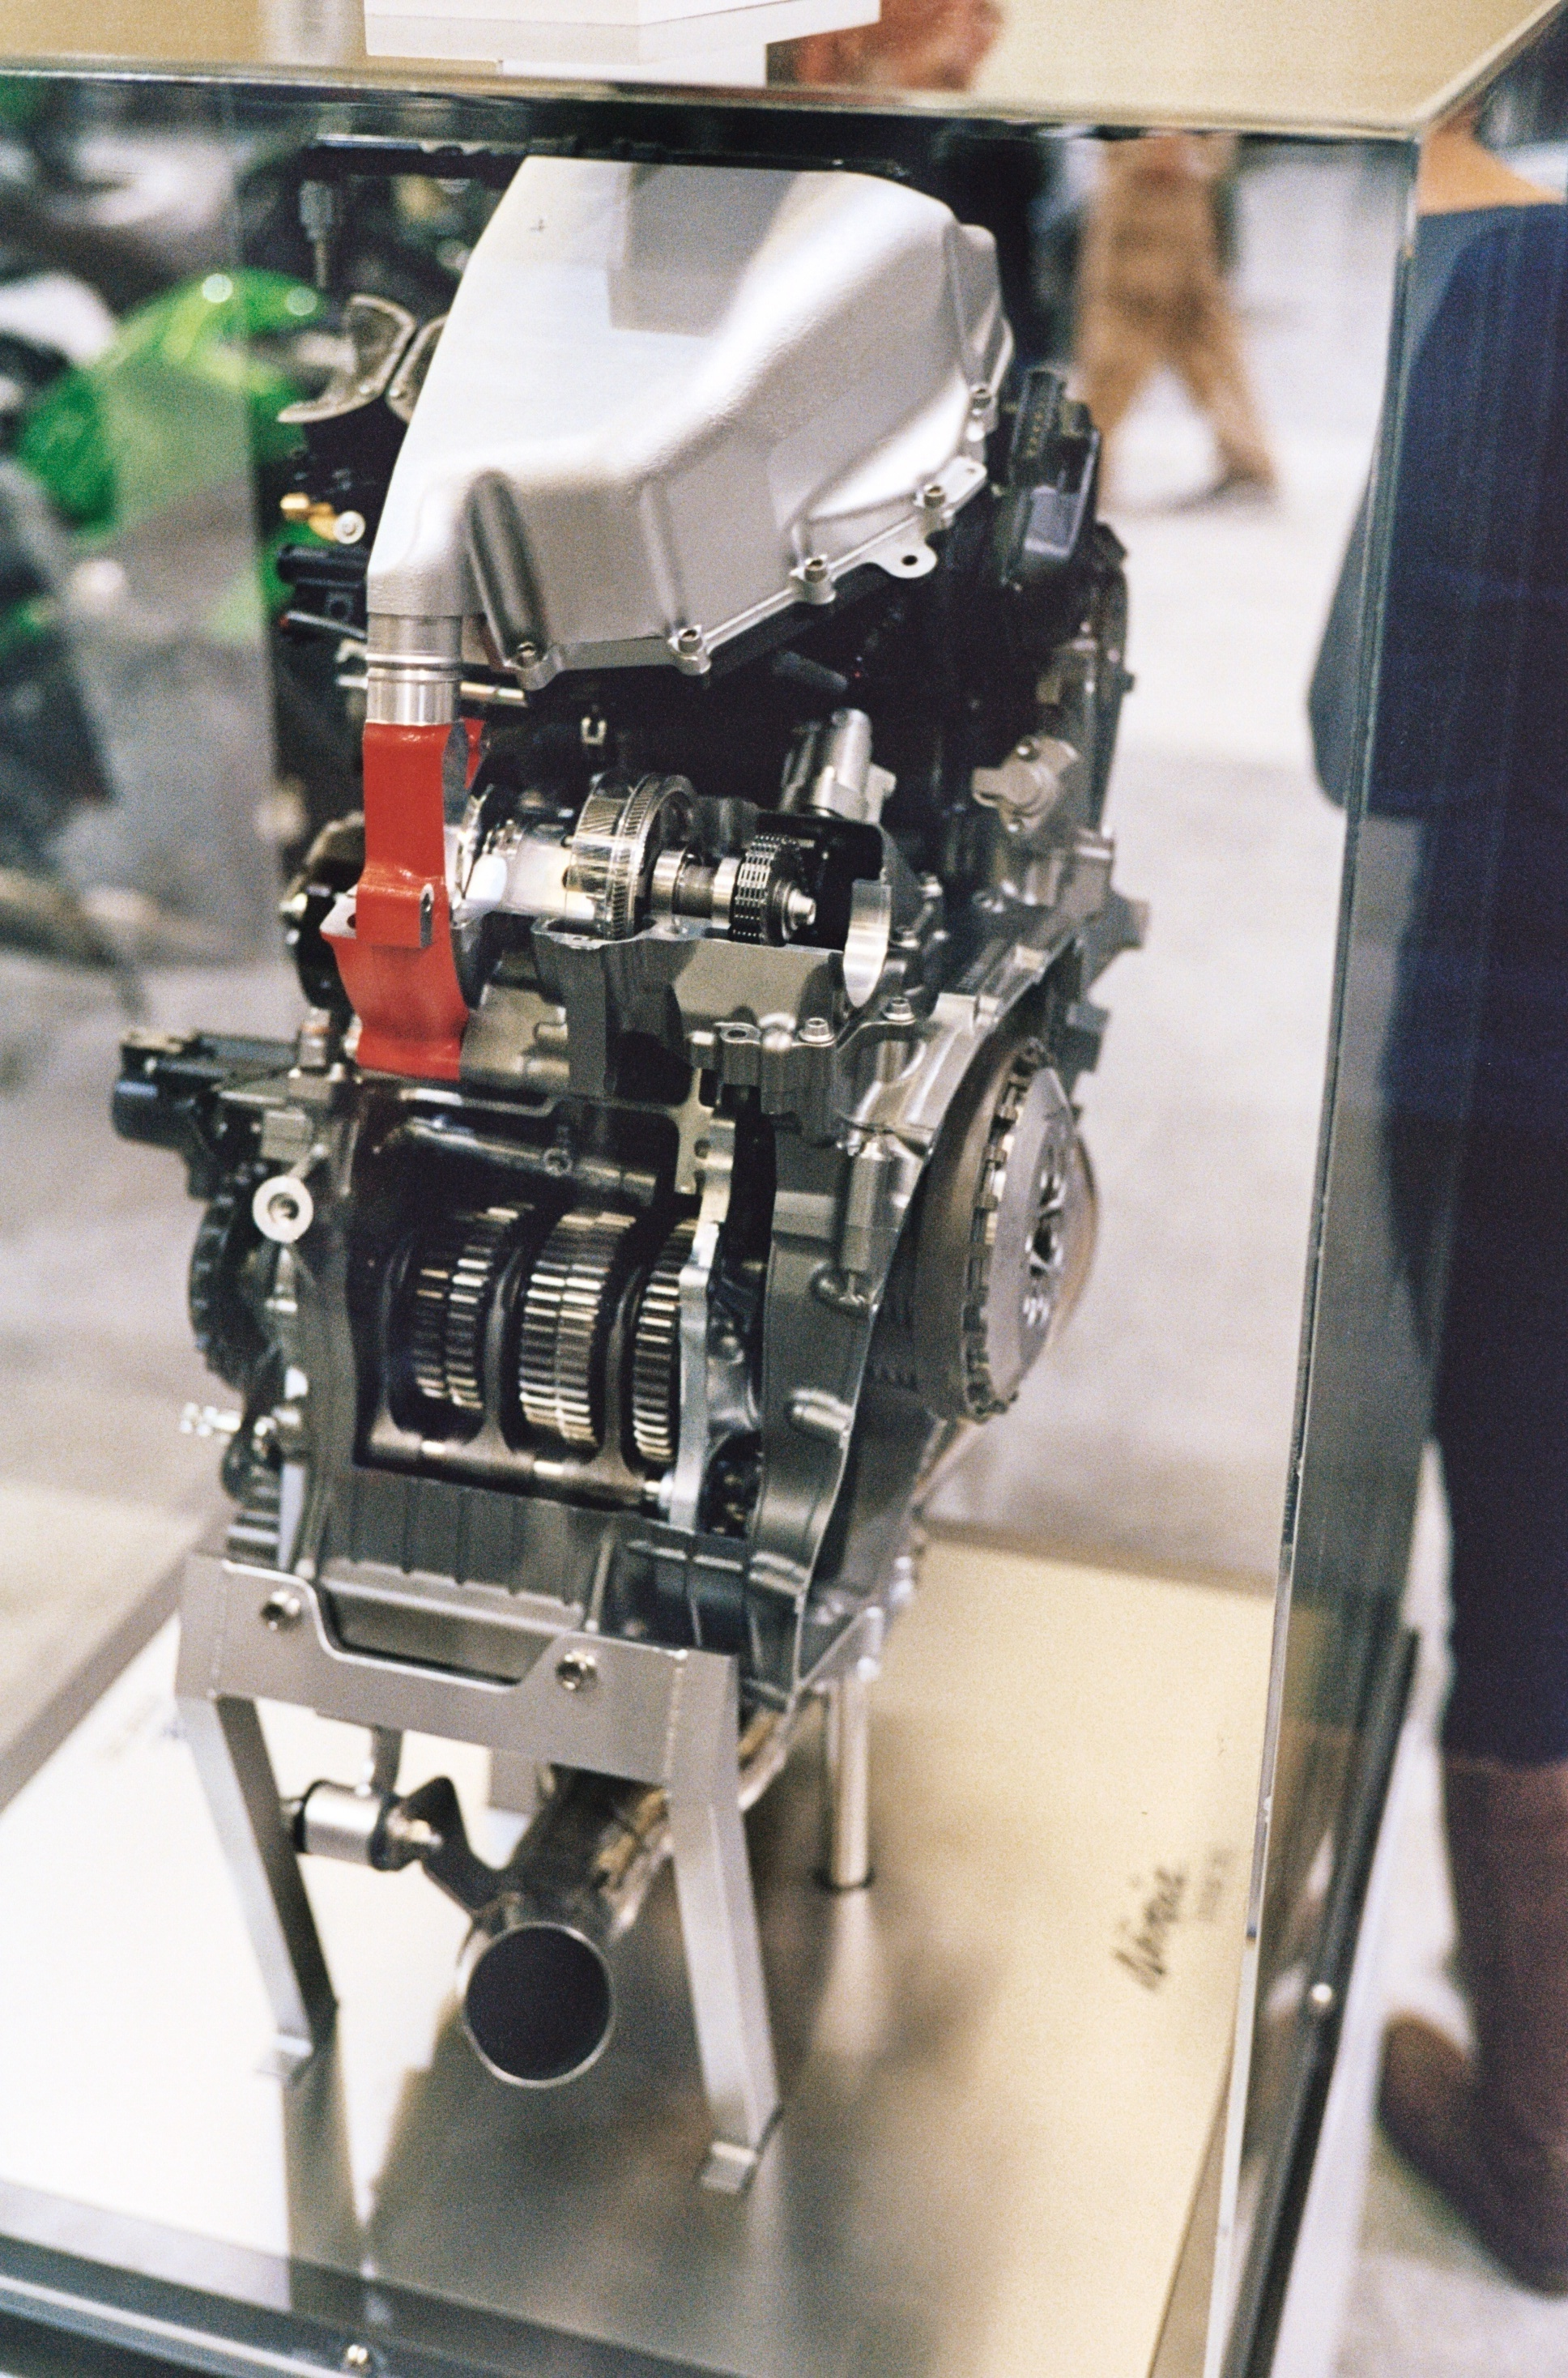 FileKawasaki Ninja H2R Engine Cutaway RearJPG